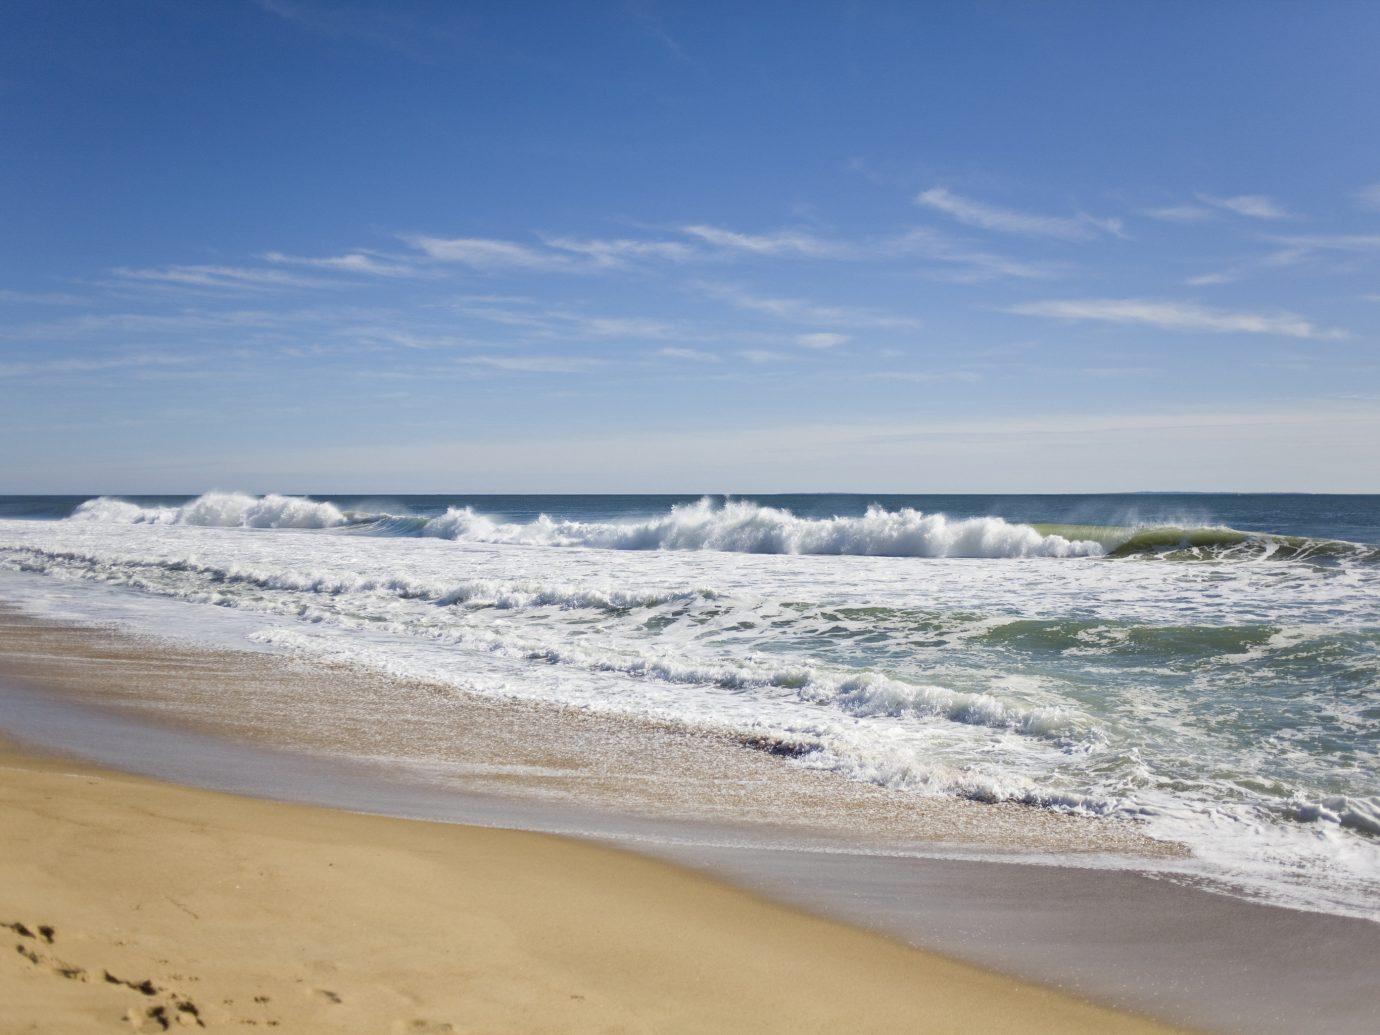 Secret Getaways Trip Ideas sky outdoor water Beach Nature shore wind wave Ocean Sea body of water wave Coast horizon sand vacation cape sandy